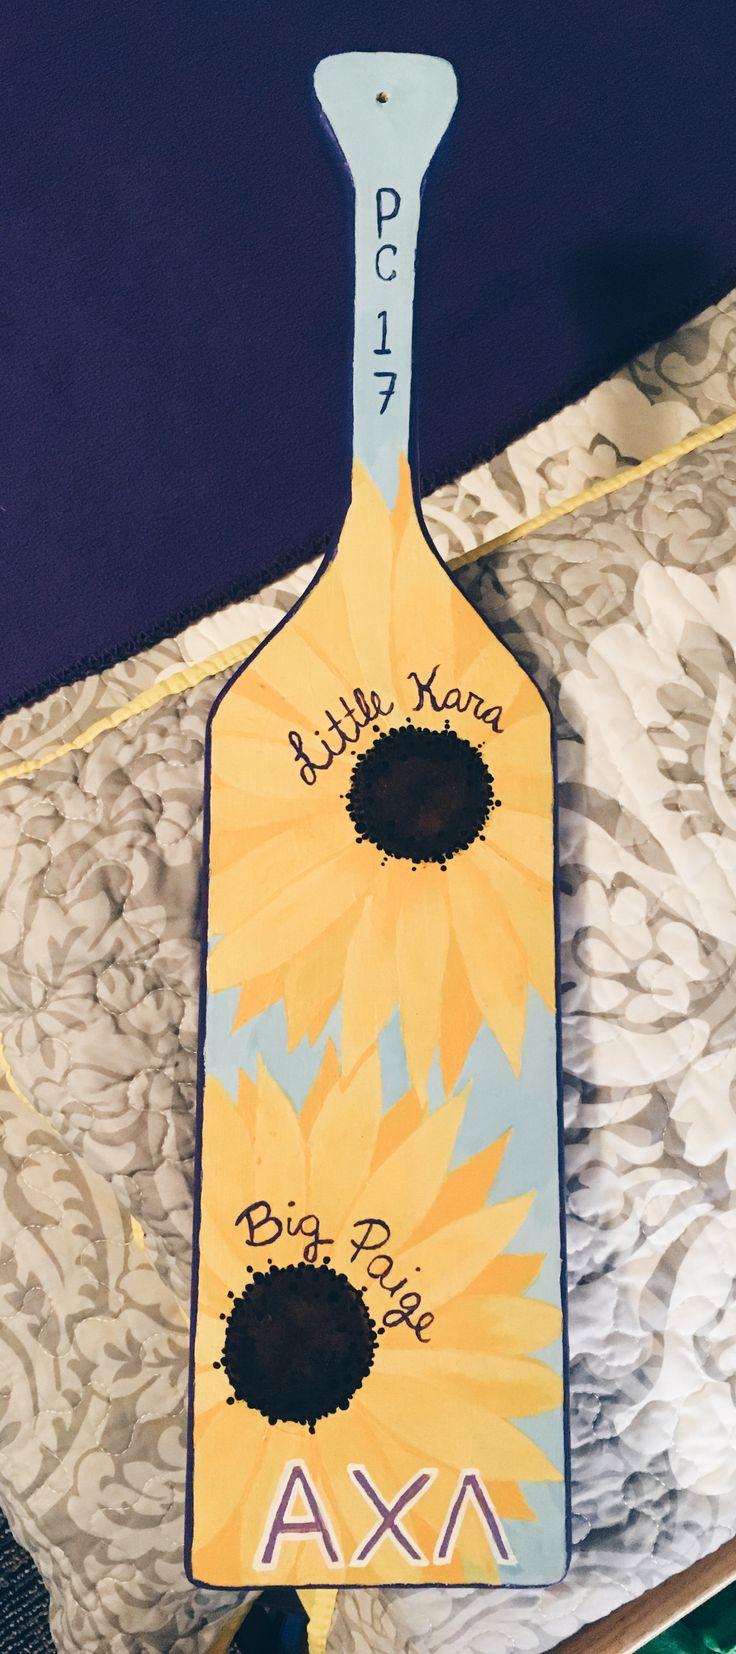 big little paddle